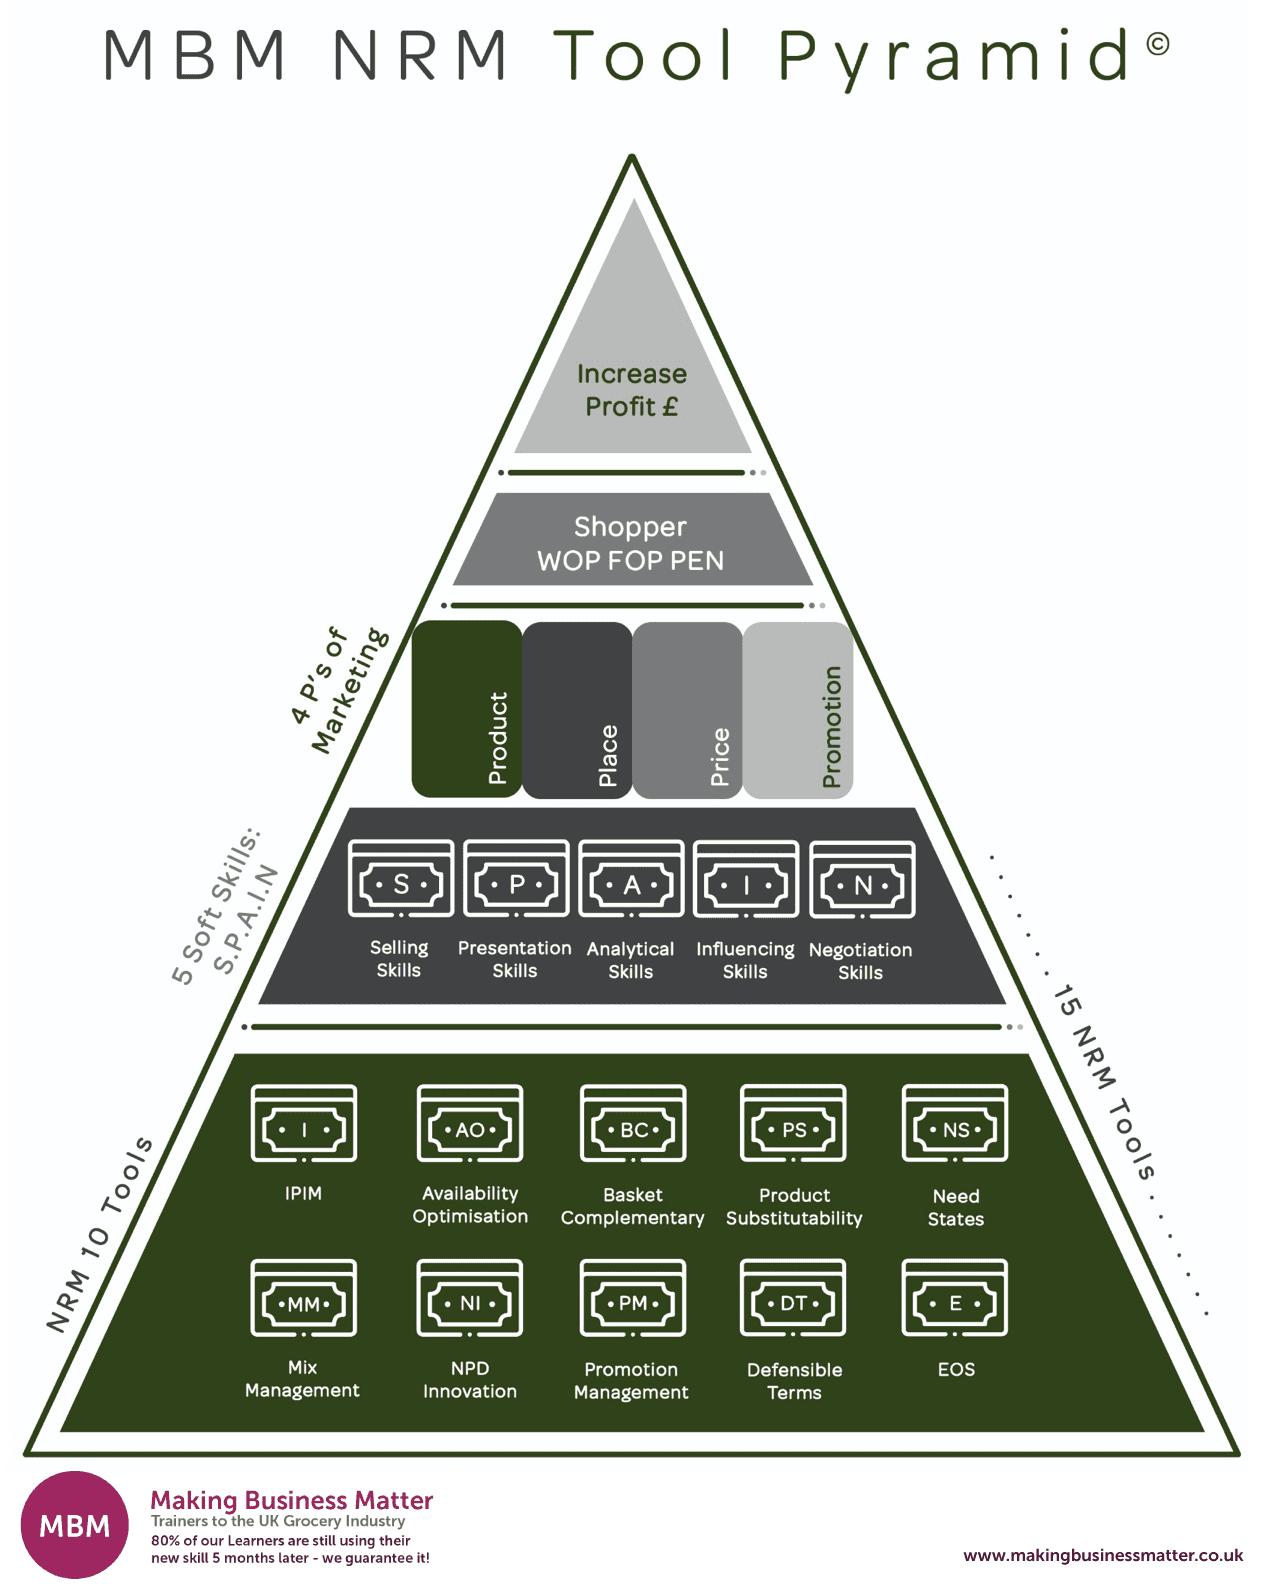 MBM NRM Tool Pyramid, , Net Revenue Management, NRM